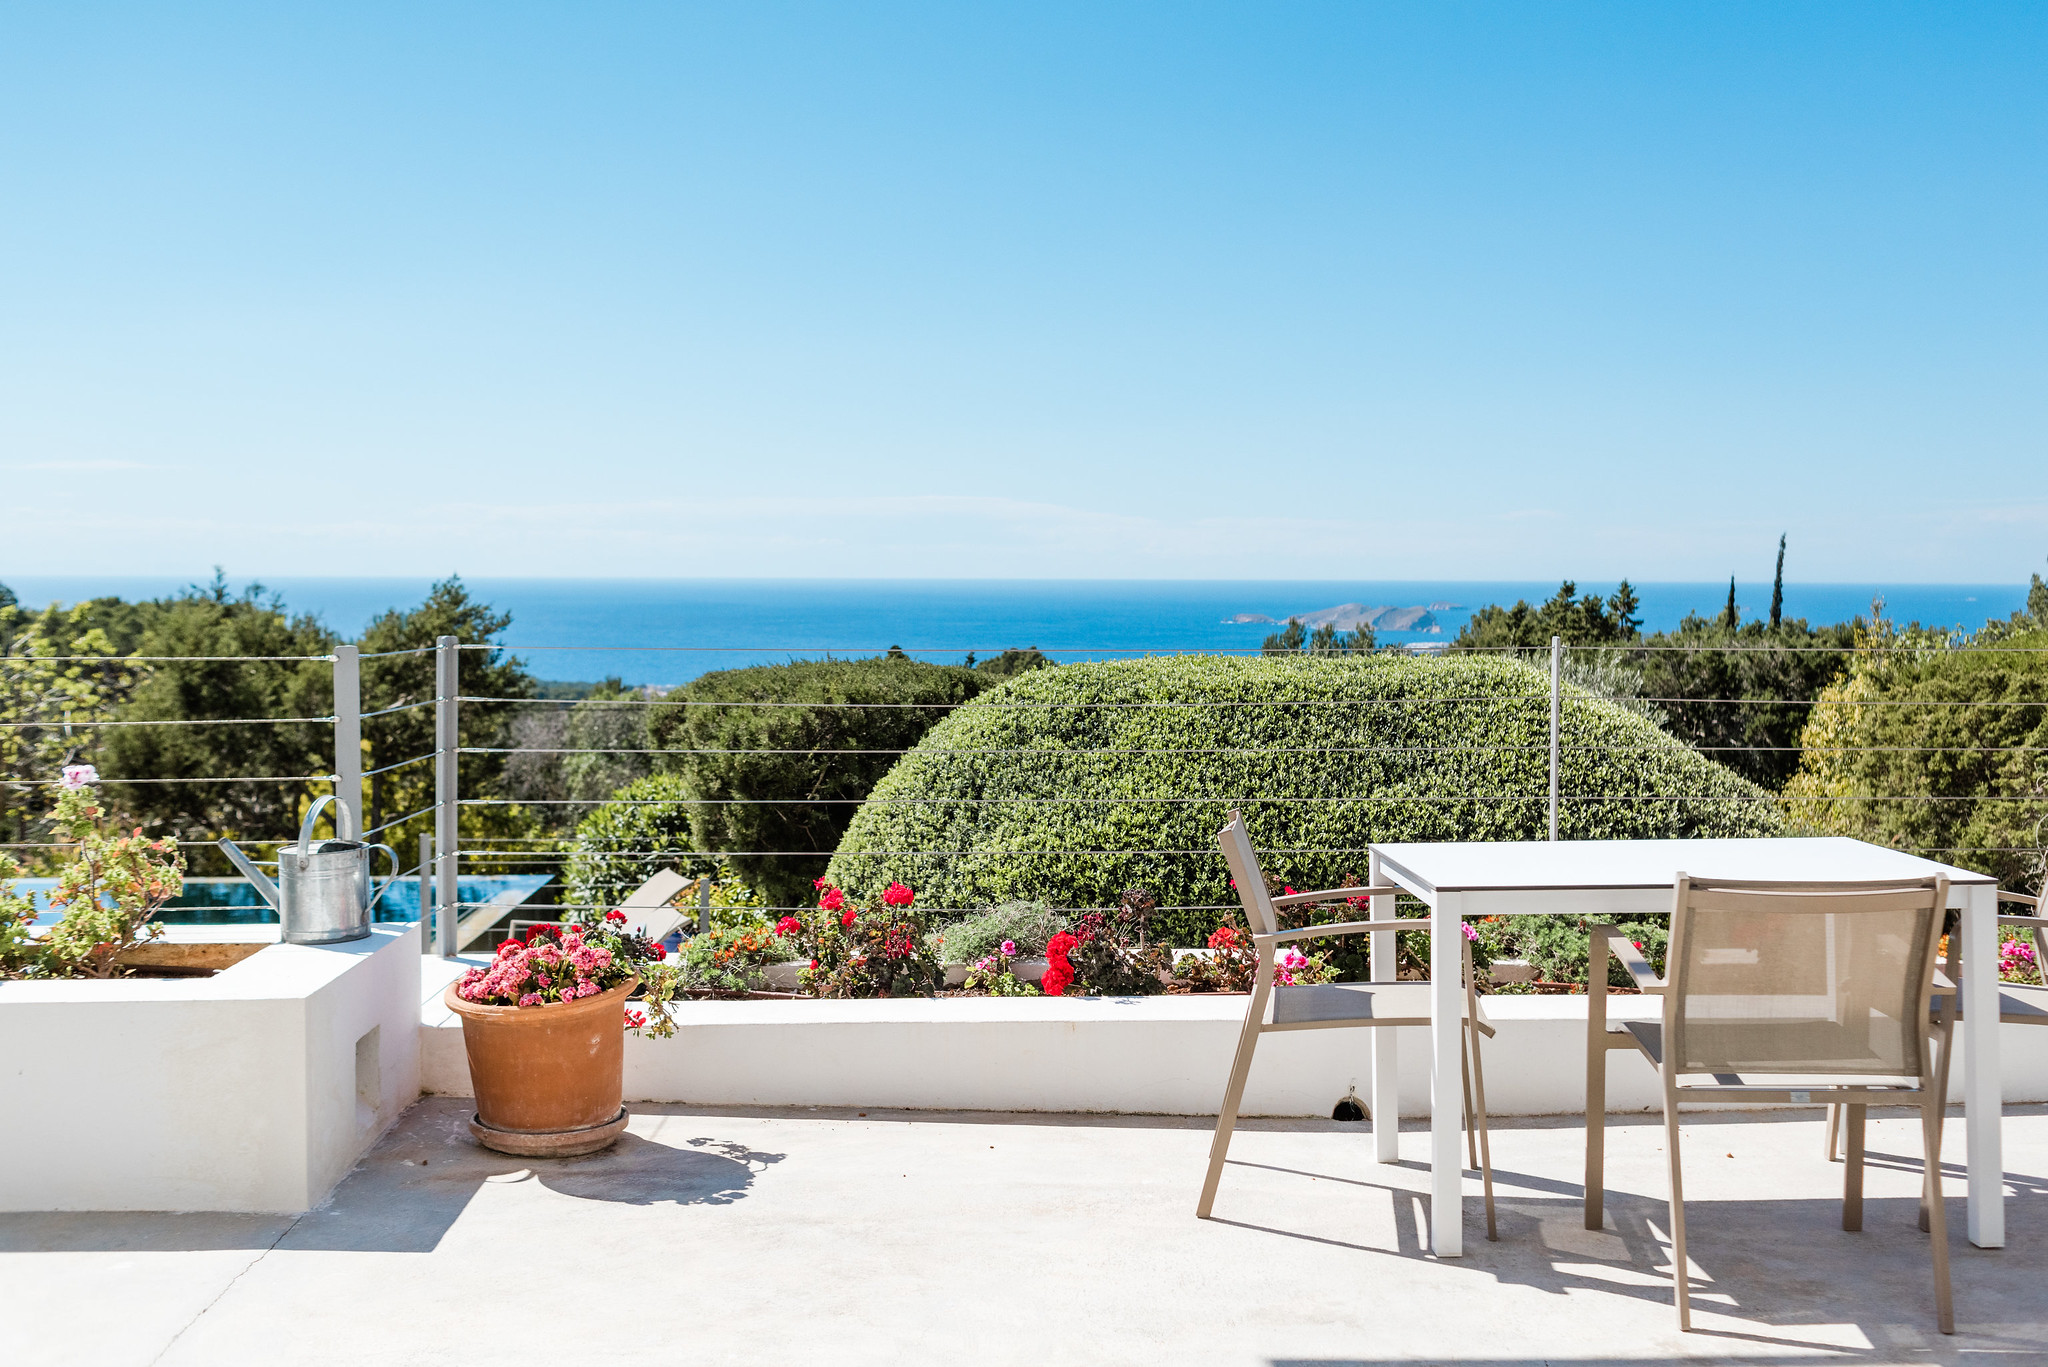 https://www.white-ibiza.com/wp-content/uploads/2020/06/white-ibiza-villas-casa-nyah-exterior-terrace-table.jpg